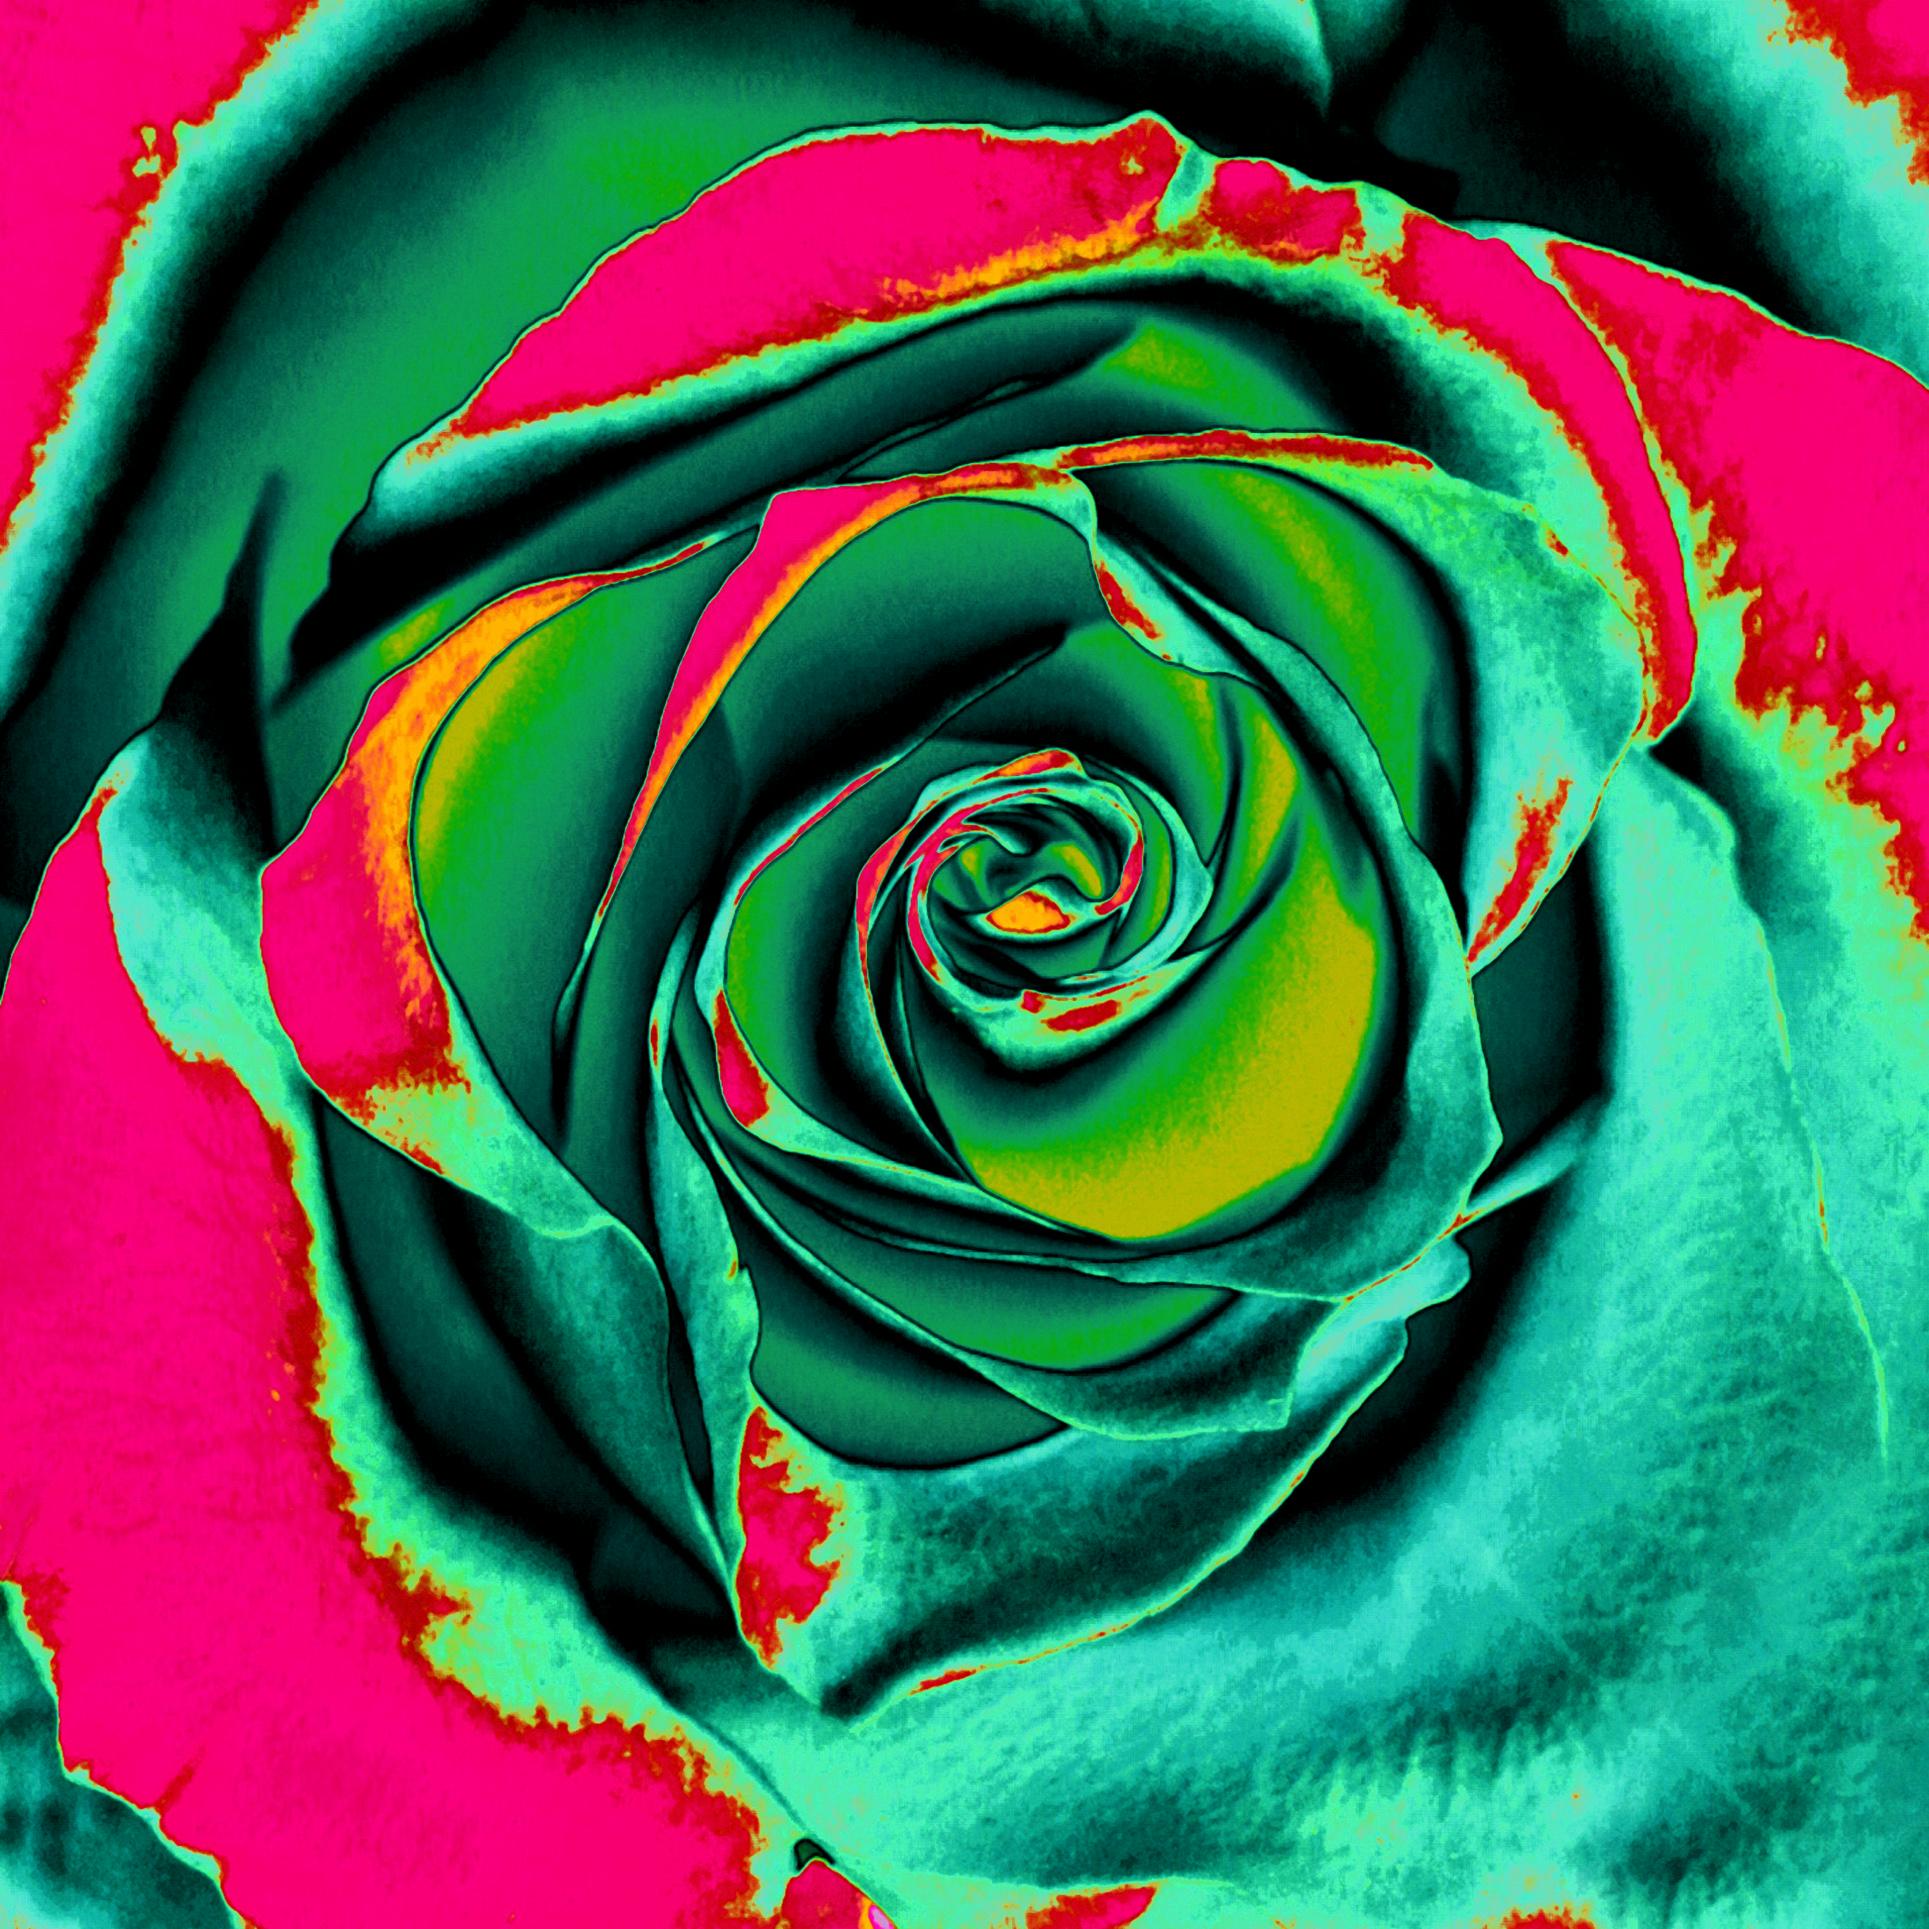 Salad as a rose III./ Šalát ako ruža III.